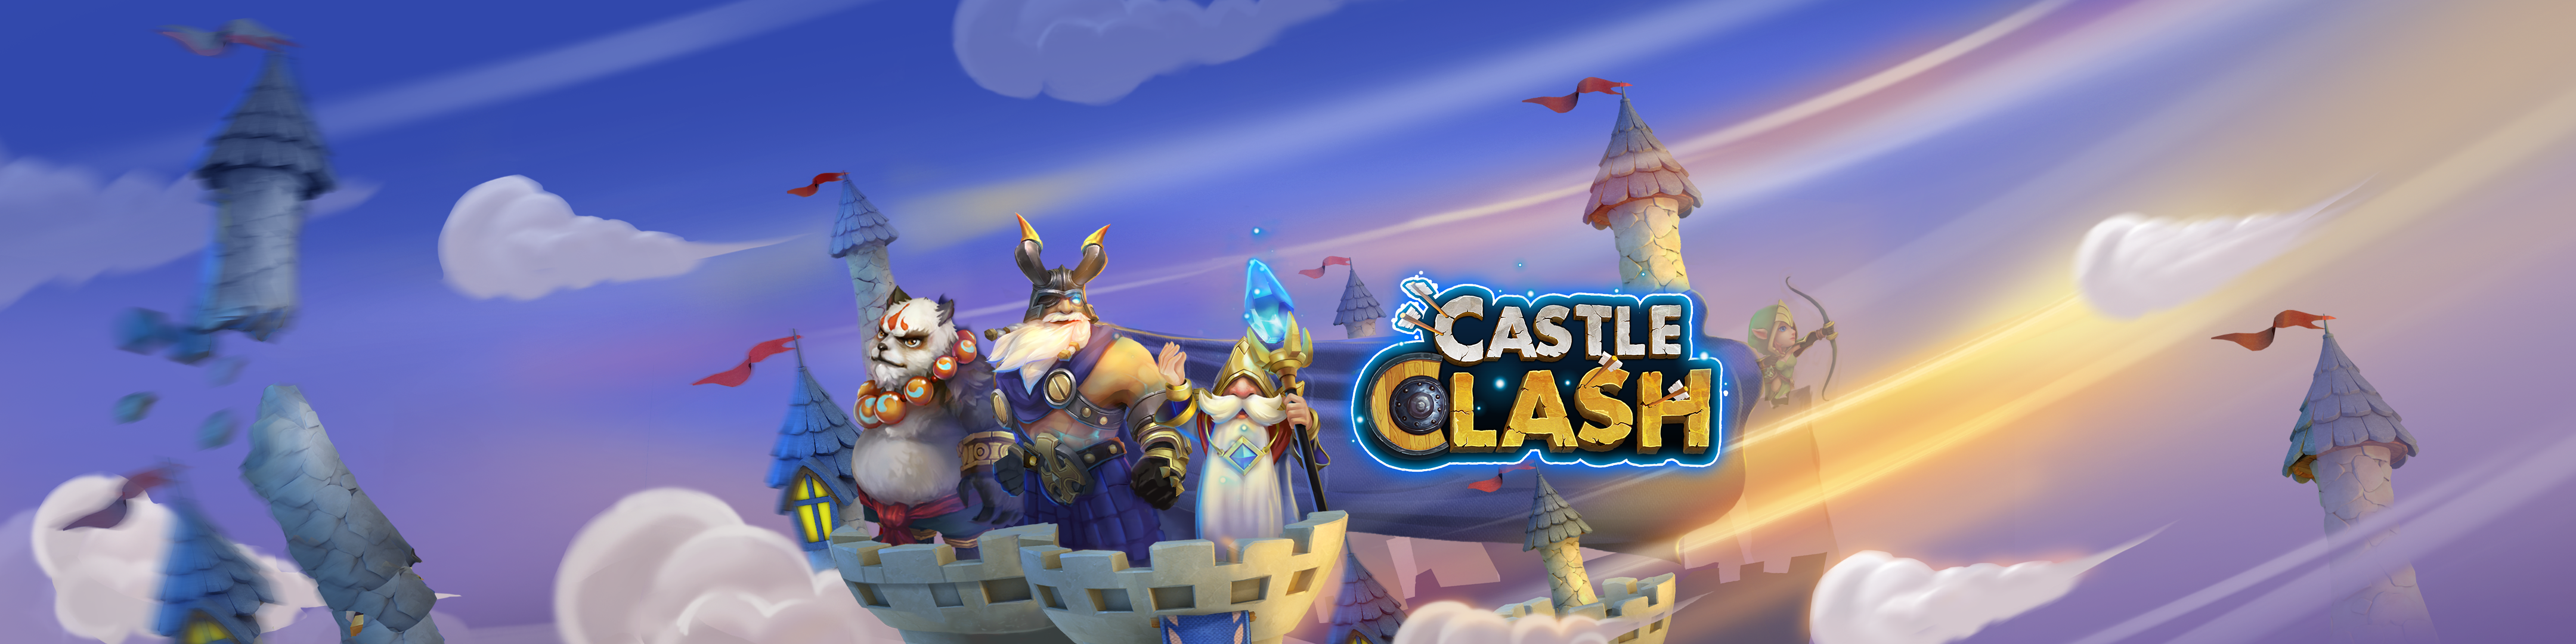 castle clash hack apk 1.3.7